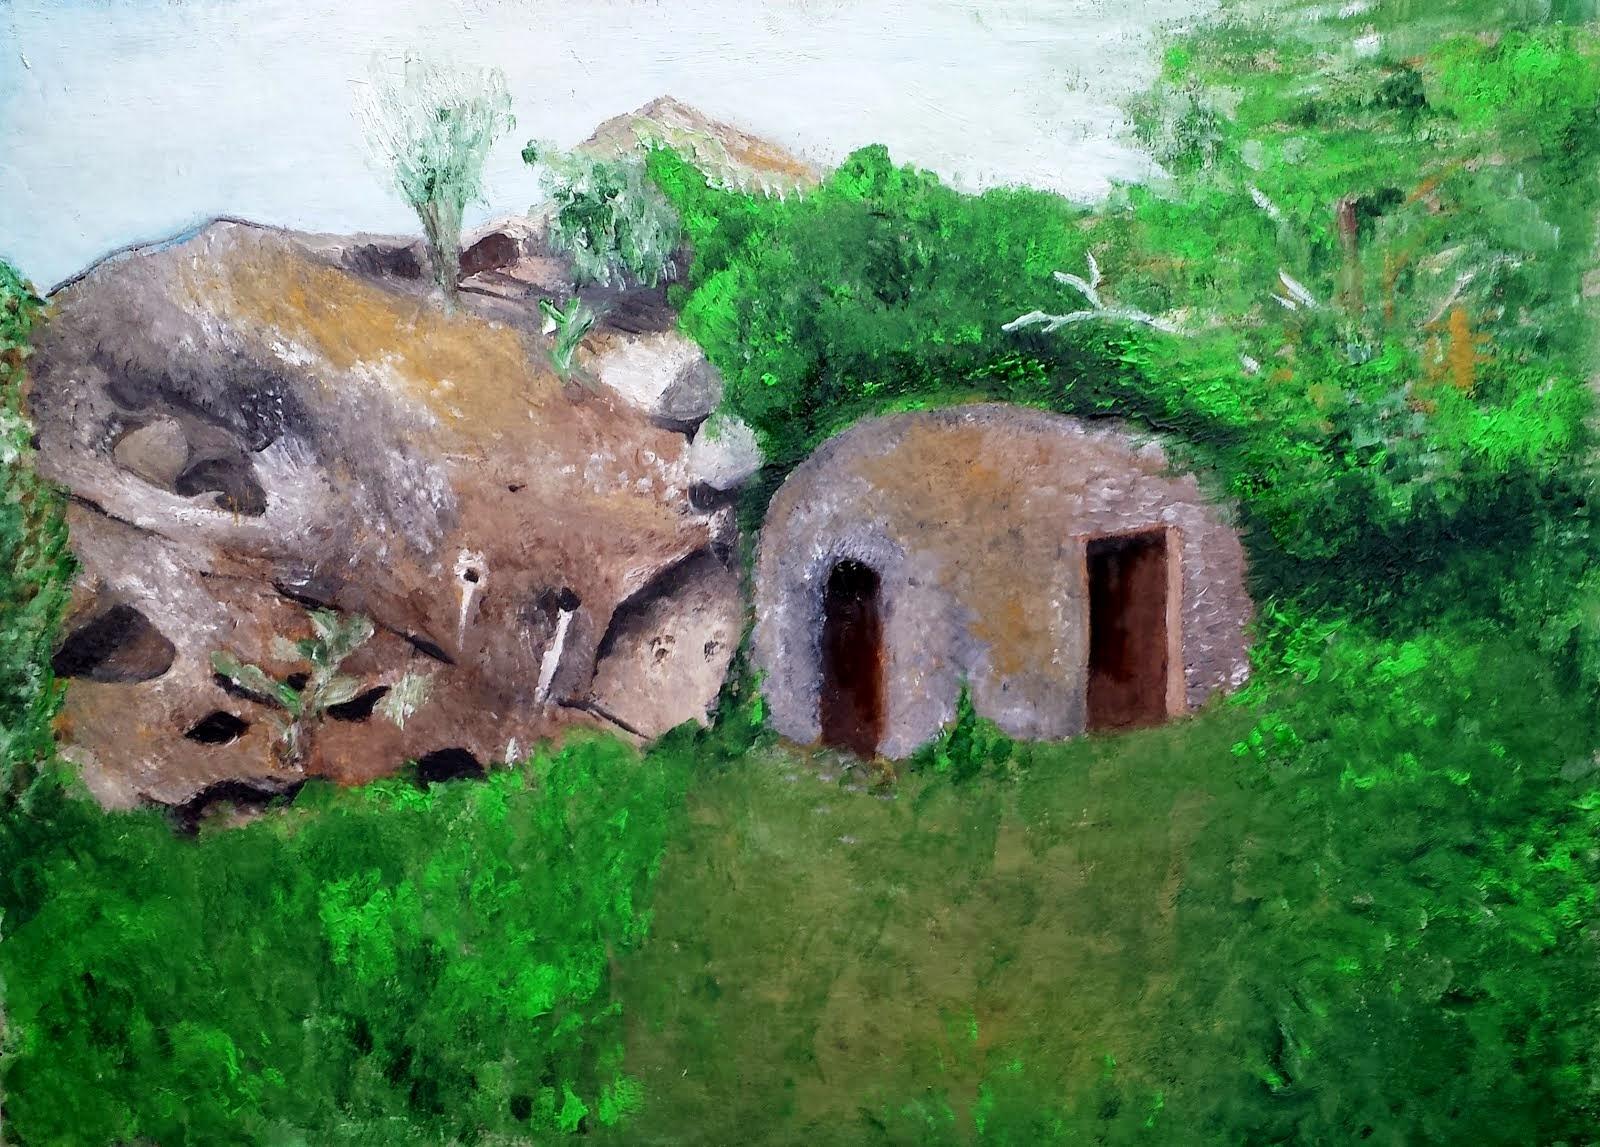 La grotta di SAN FLORIO (S.Gròlio)